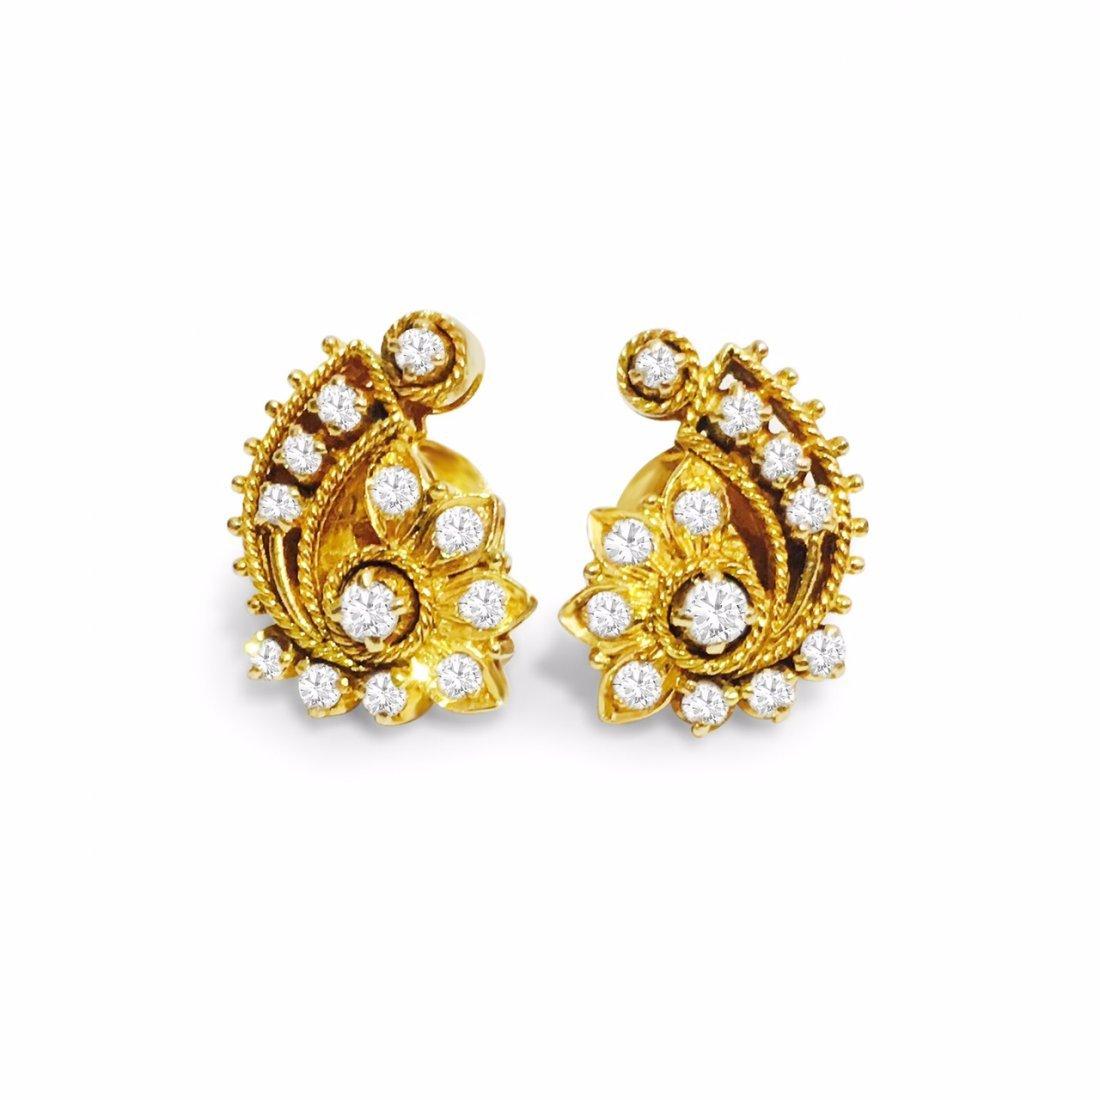 18K Yellow Gold 1 carat vintage Diamond Earrings.